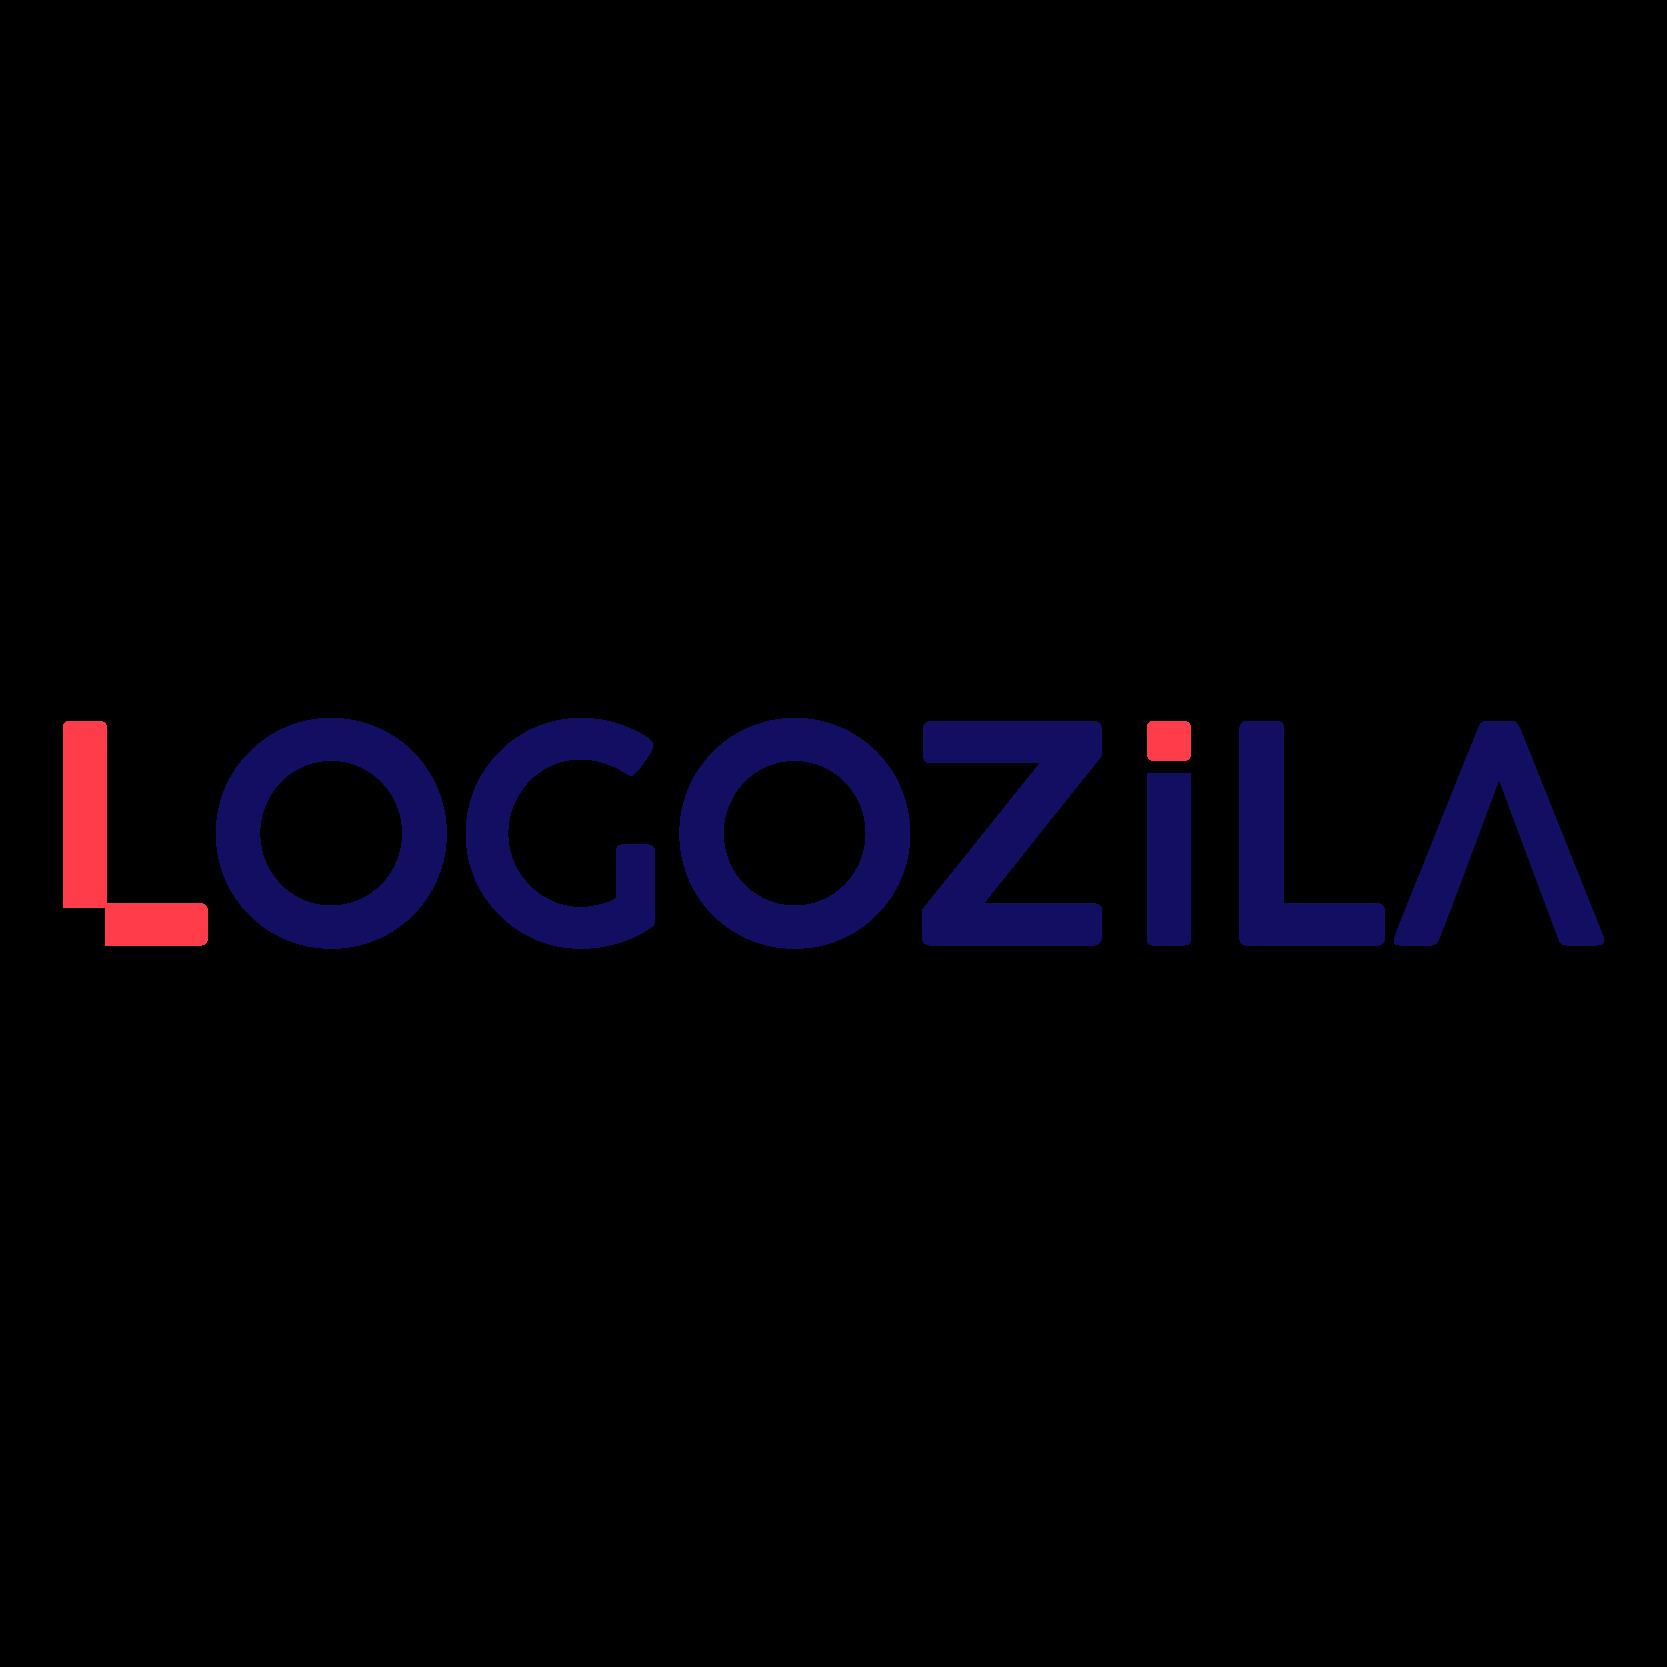 Logozila